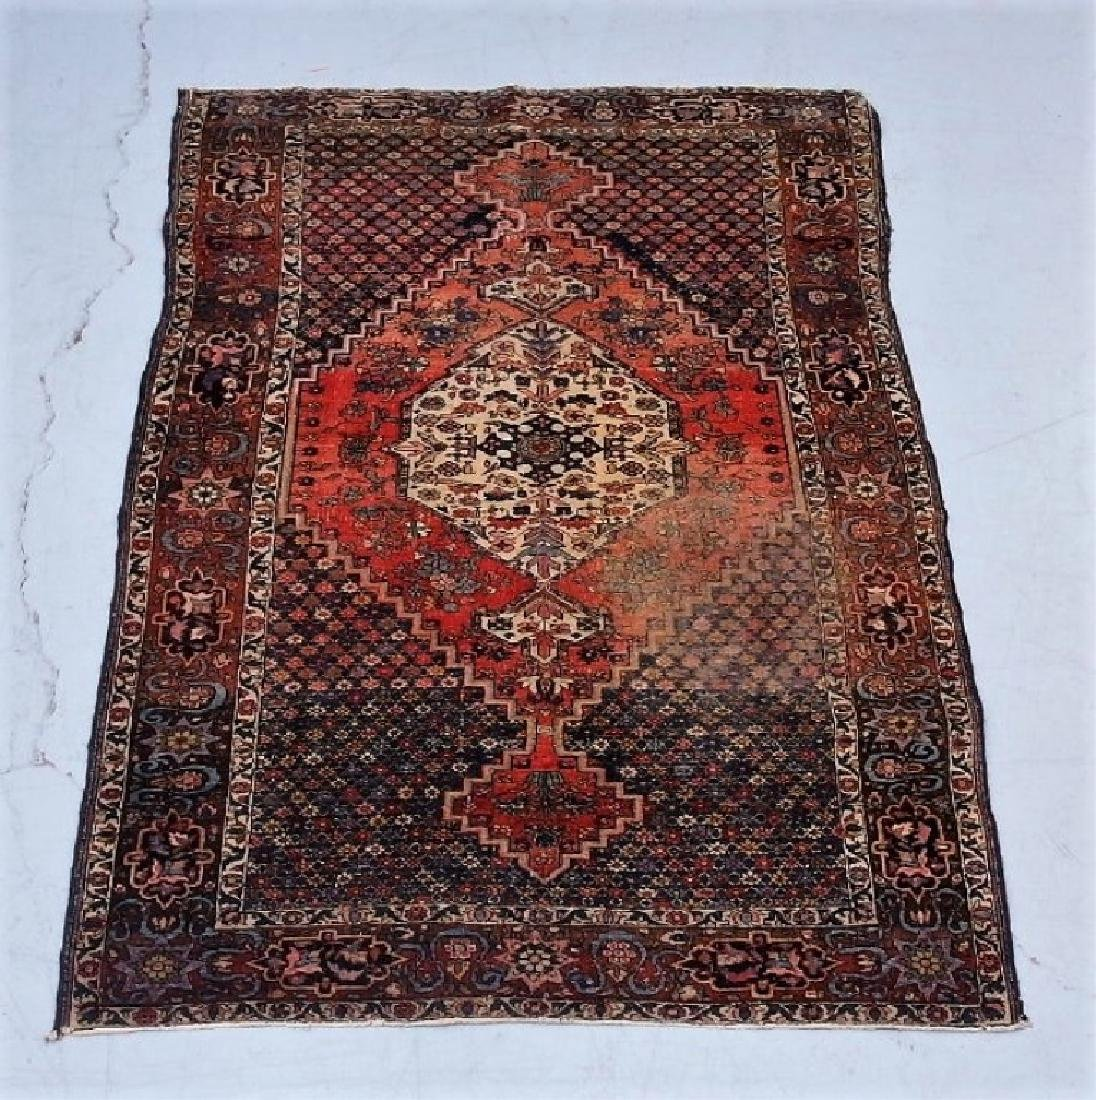 Antique Oriental Persian Geometric Rug